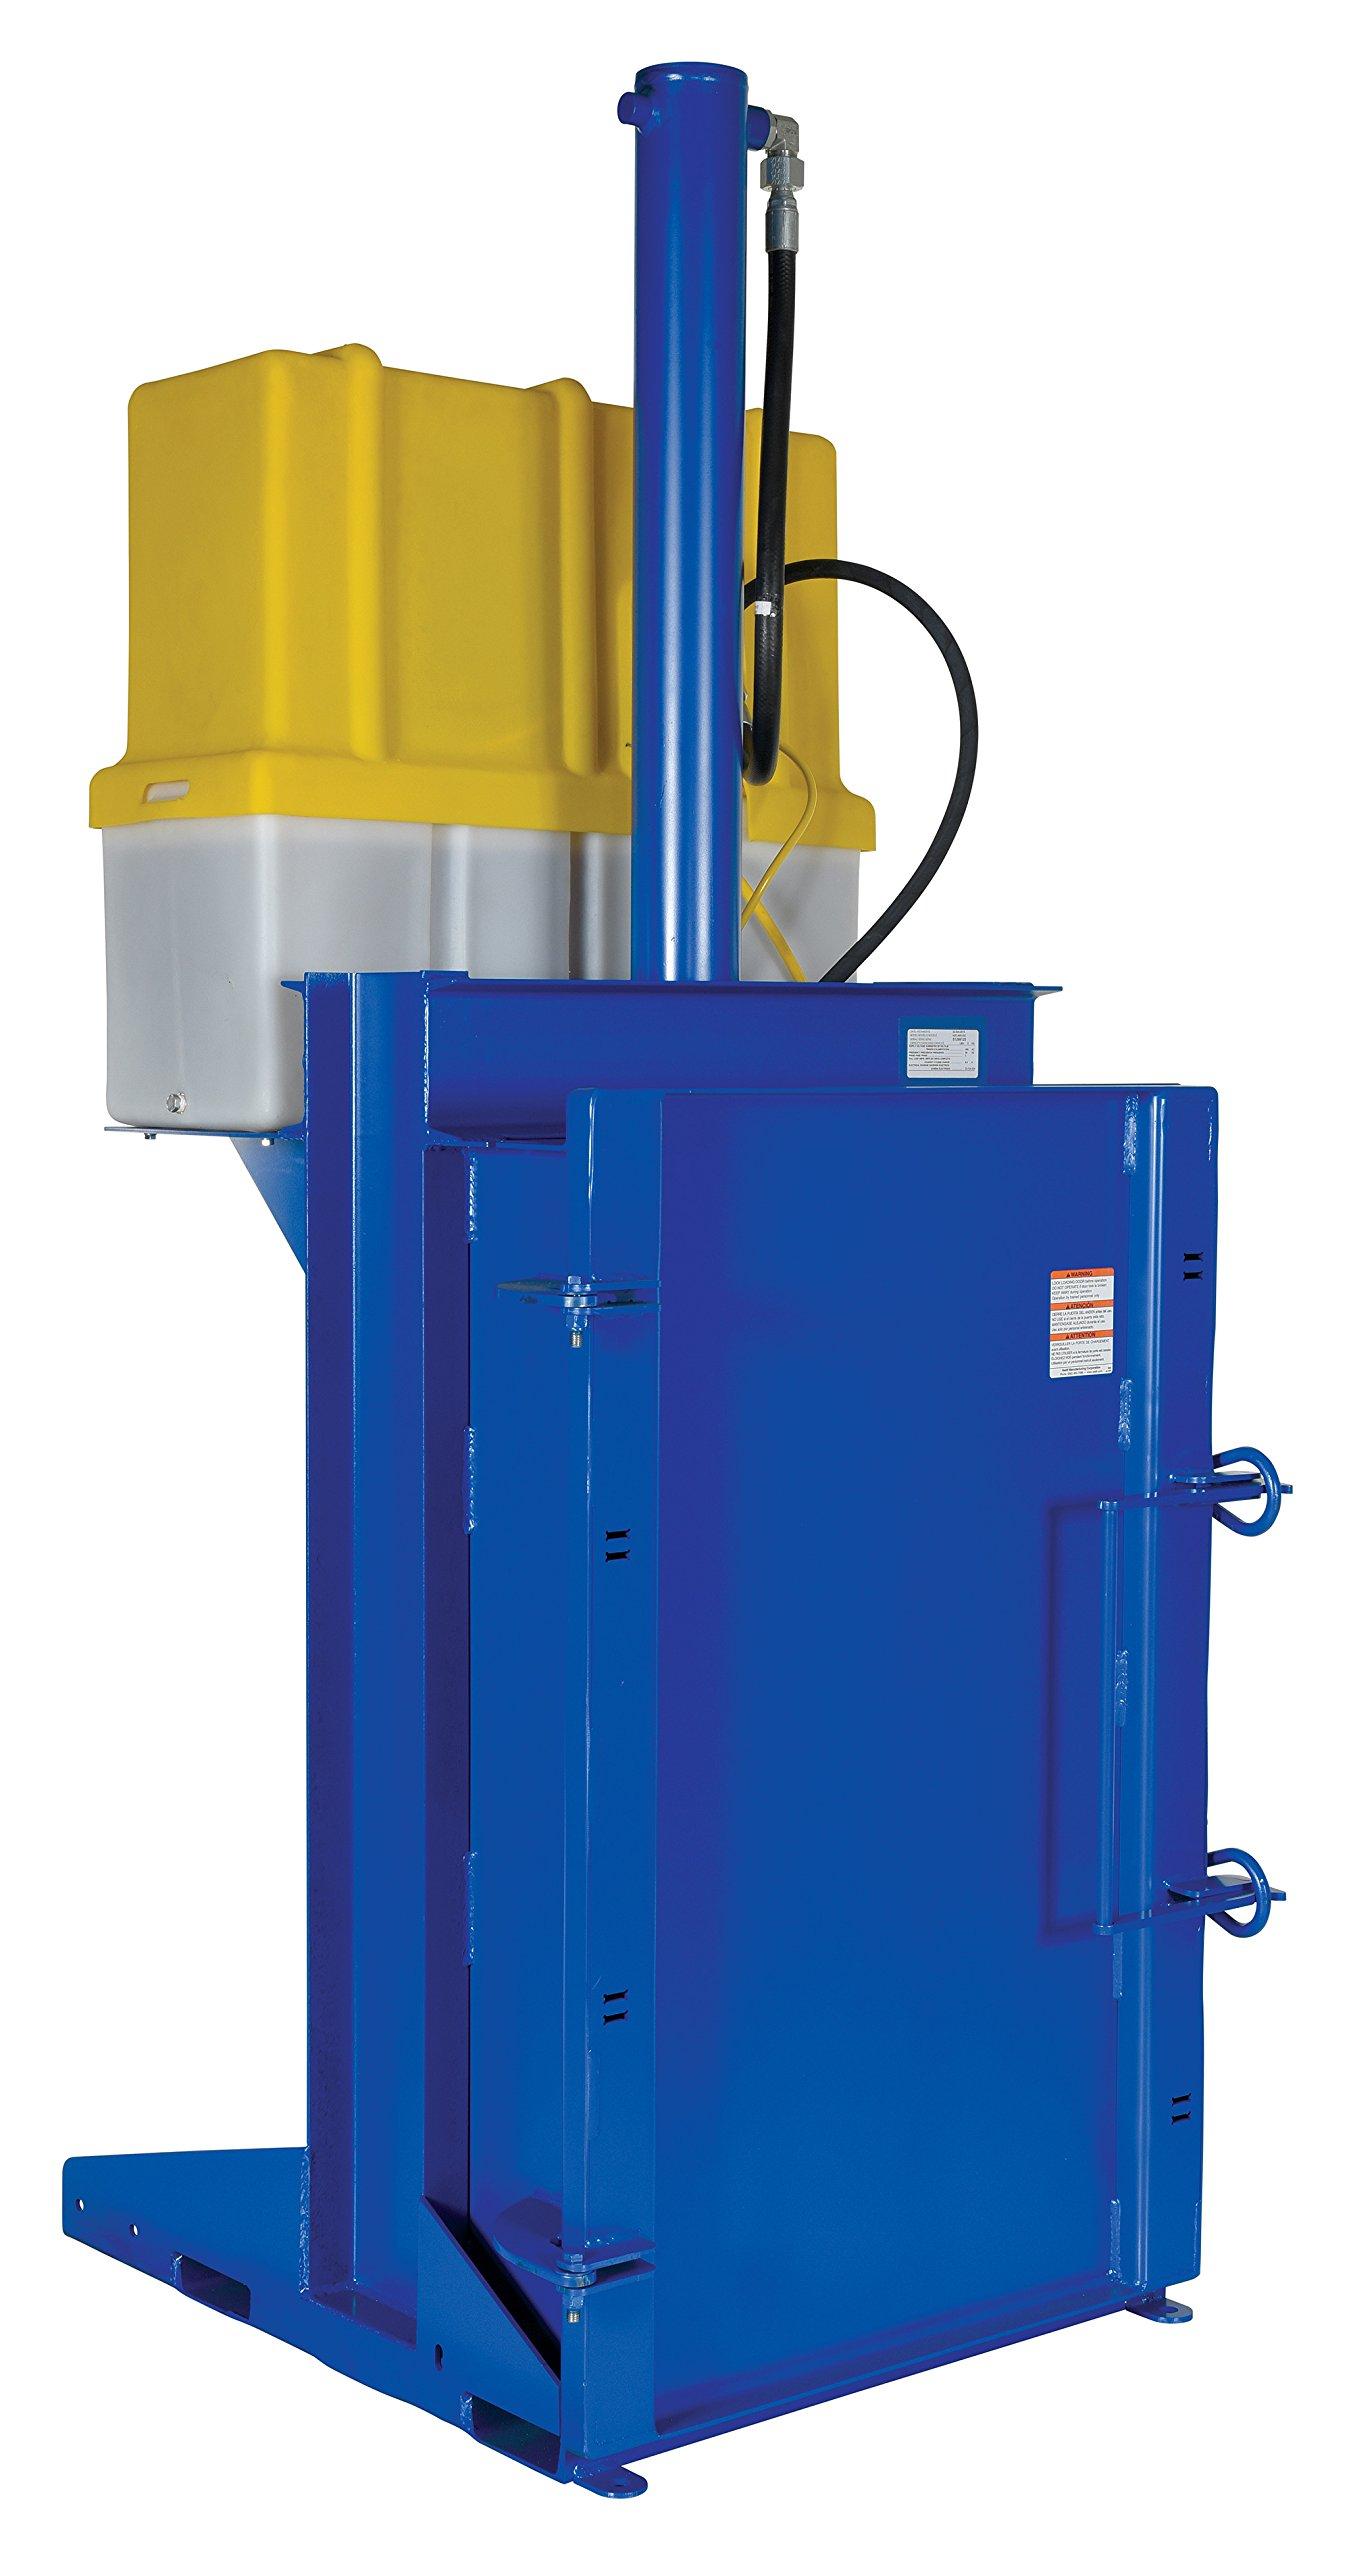 Vestil HDC-905-IDC/230V Hydraulic Drum Crusher/Compactor, 38.19'' Length, 230V